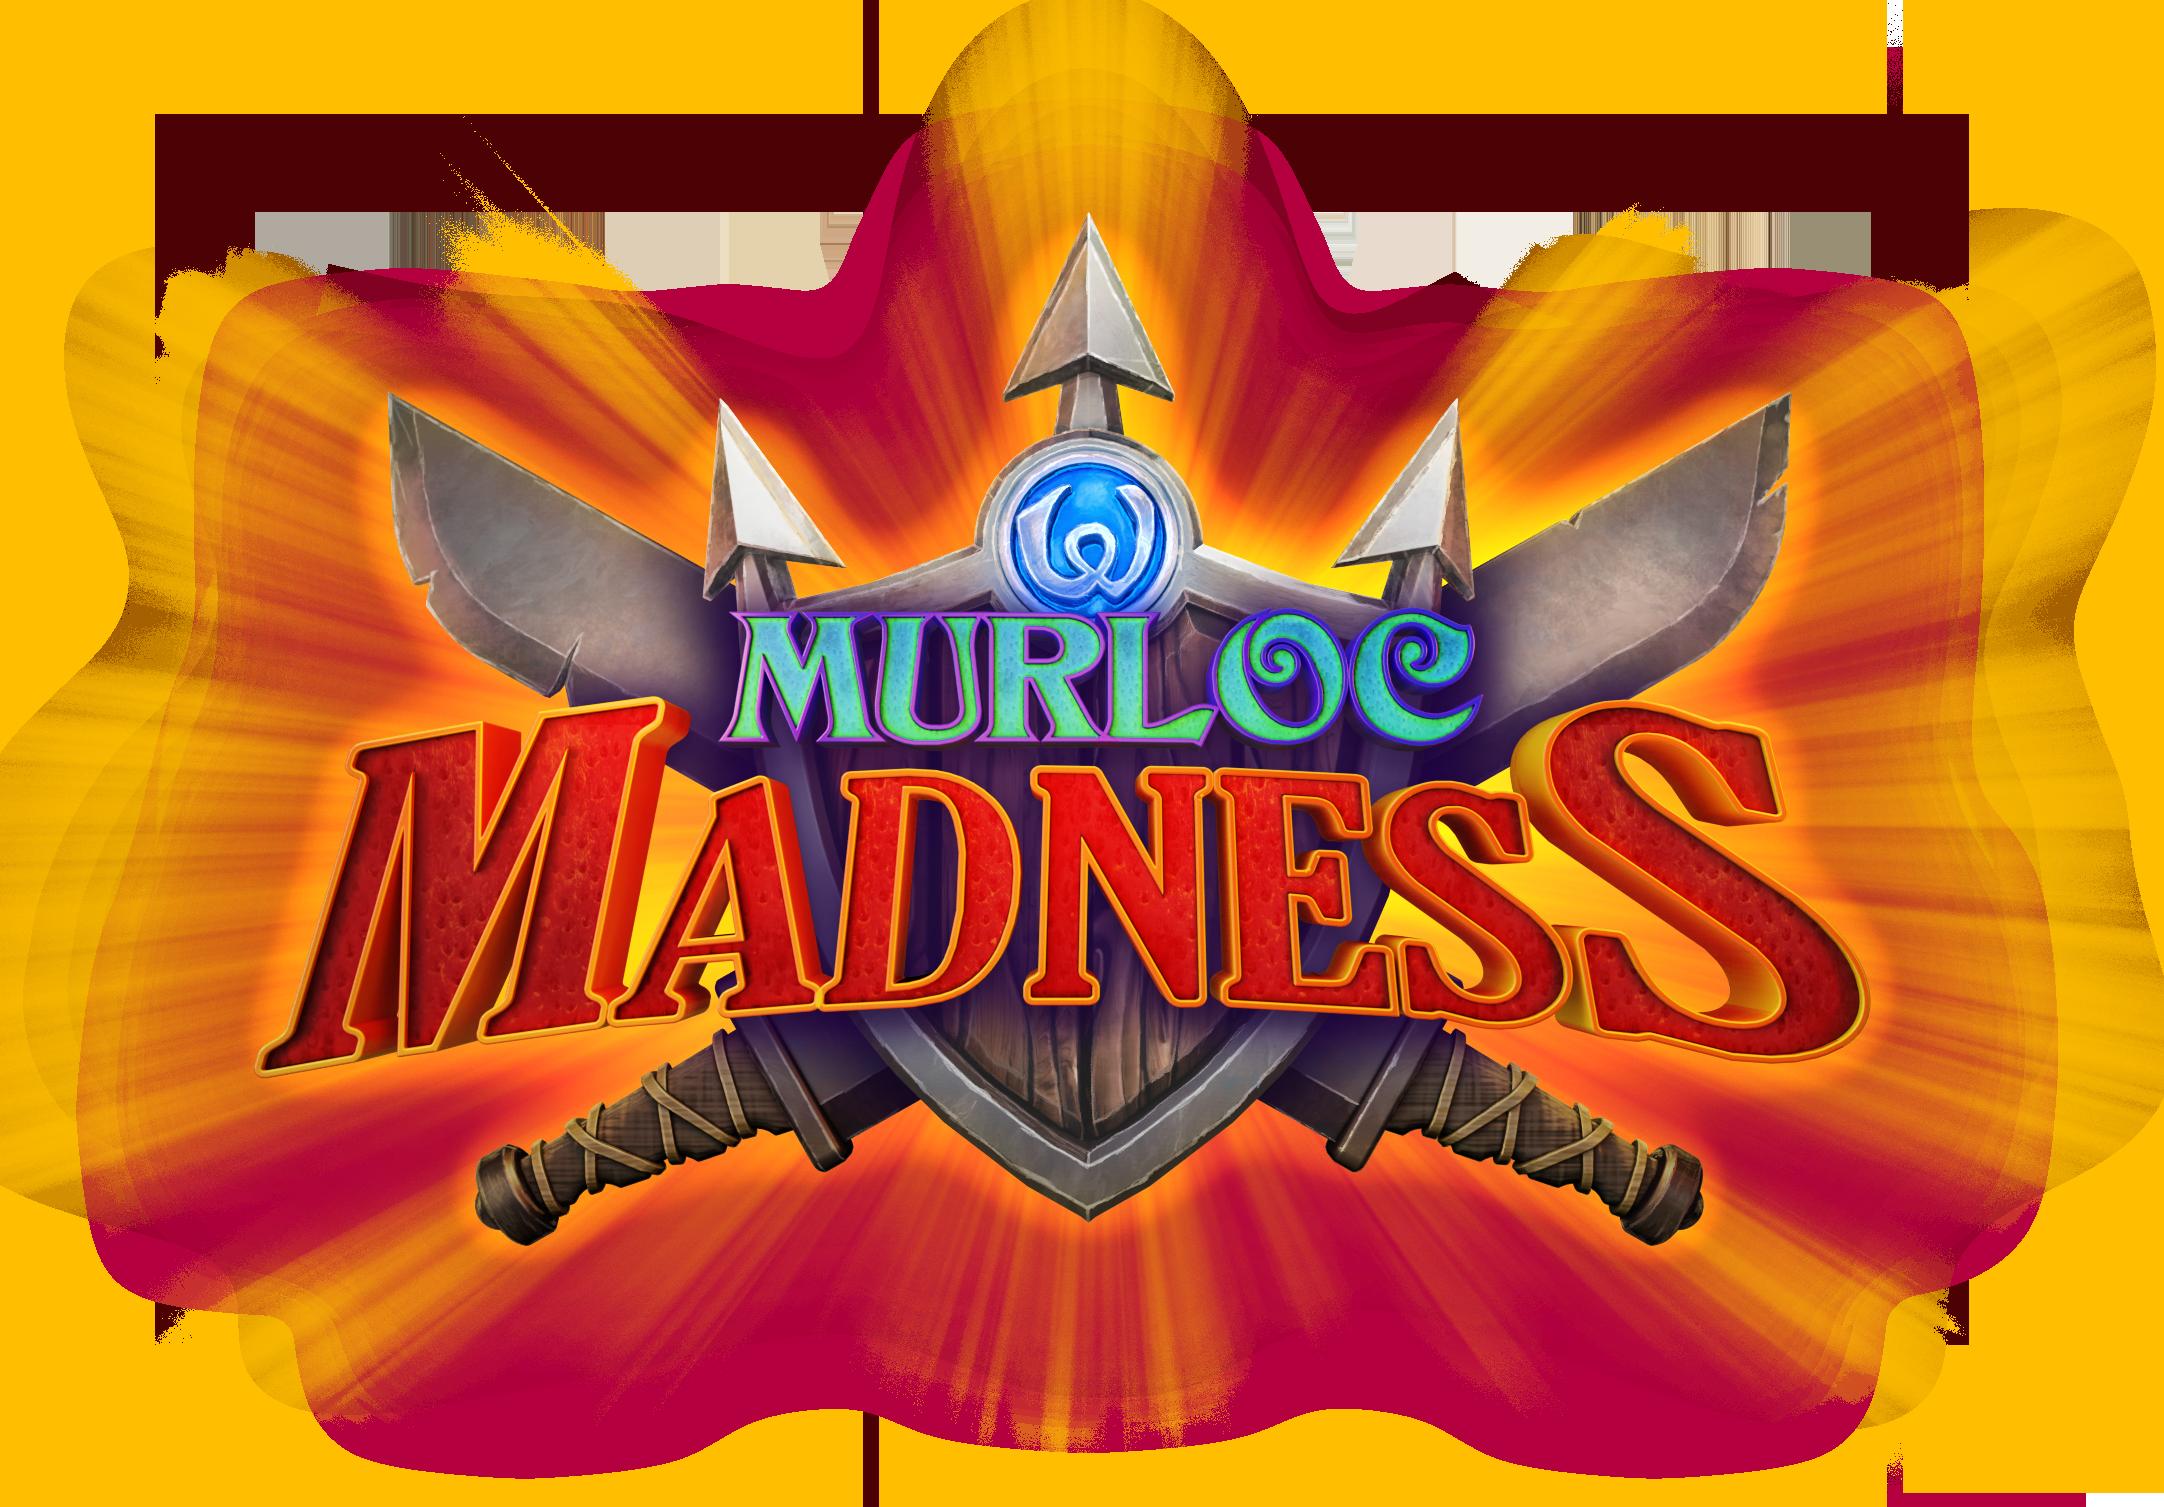 Murloc Madness!